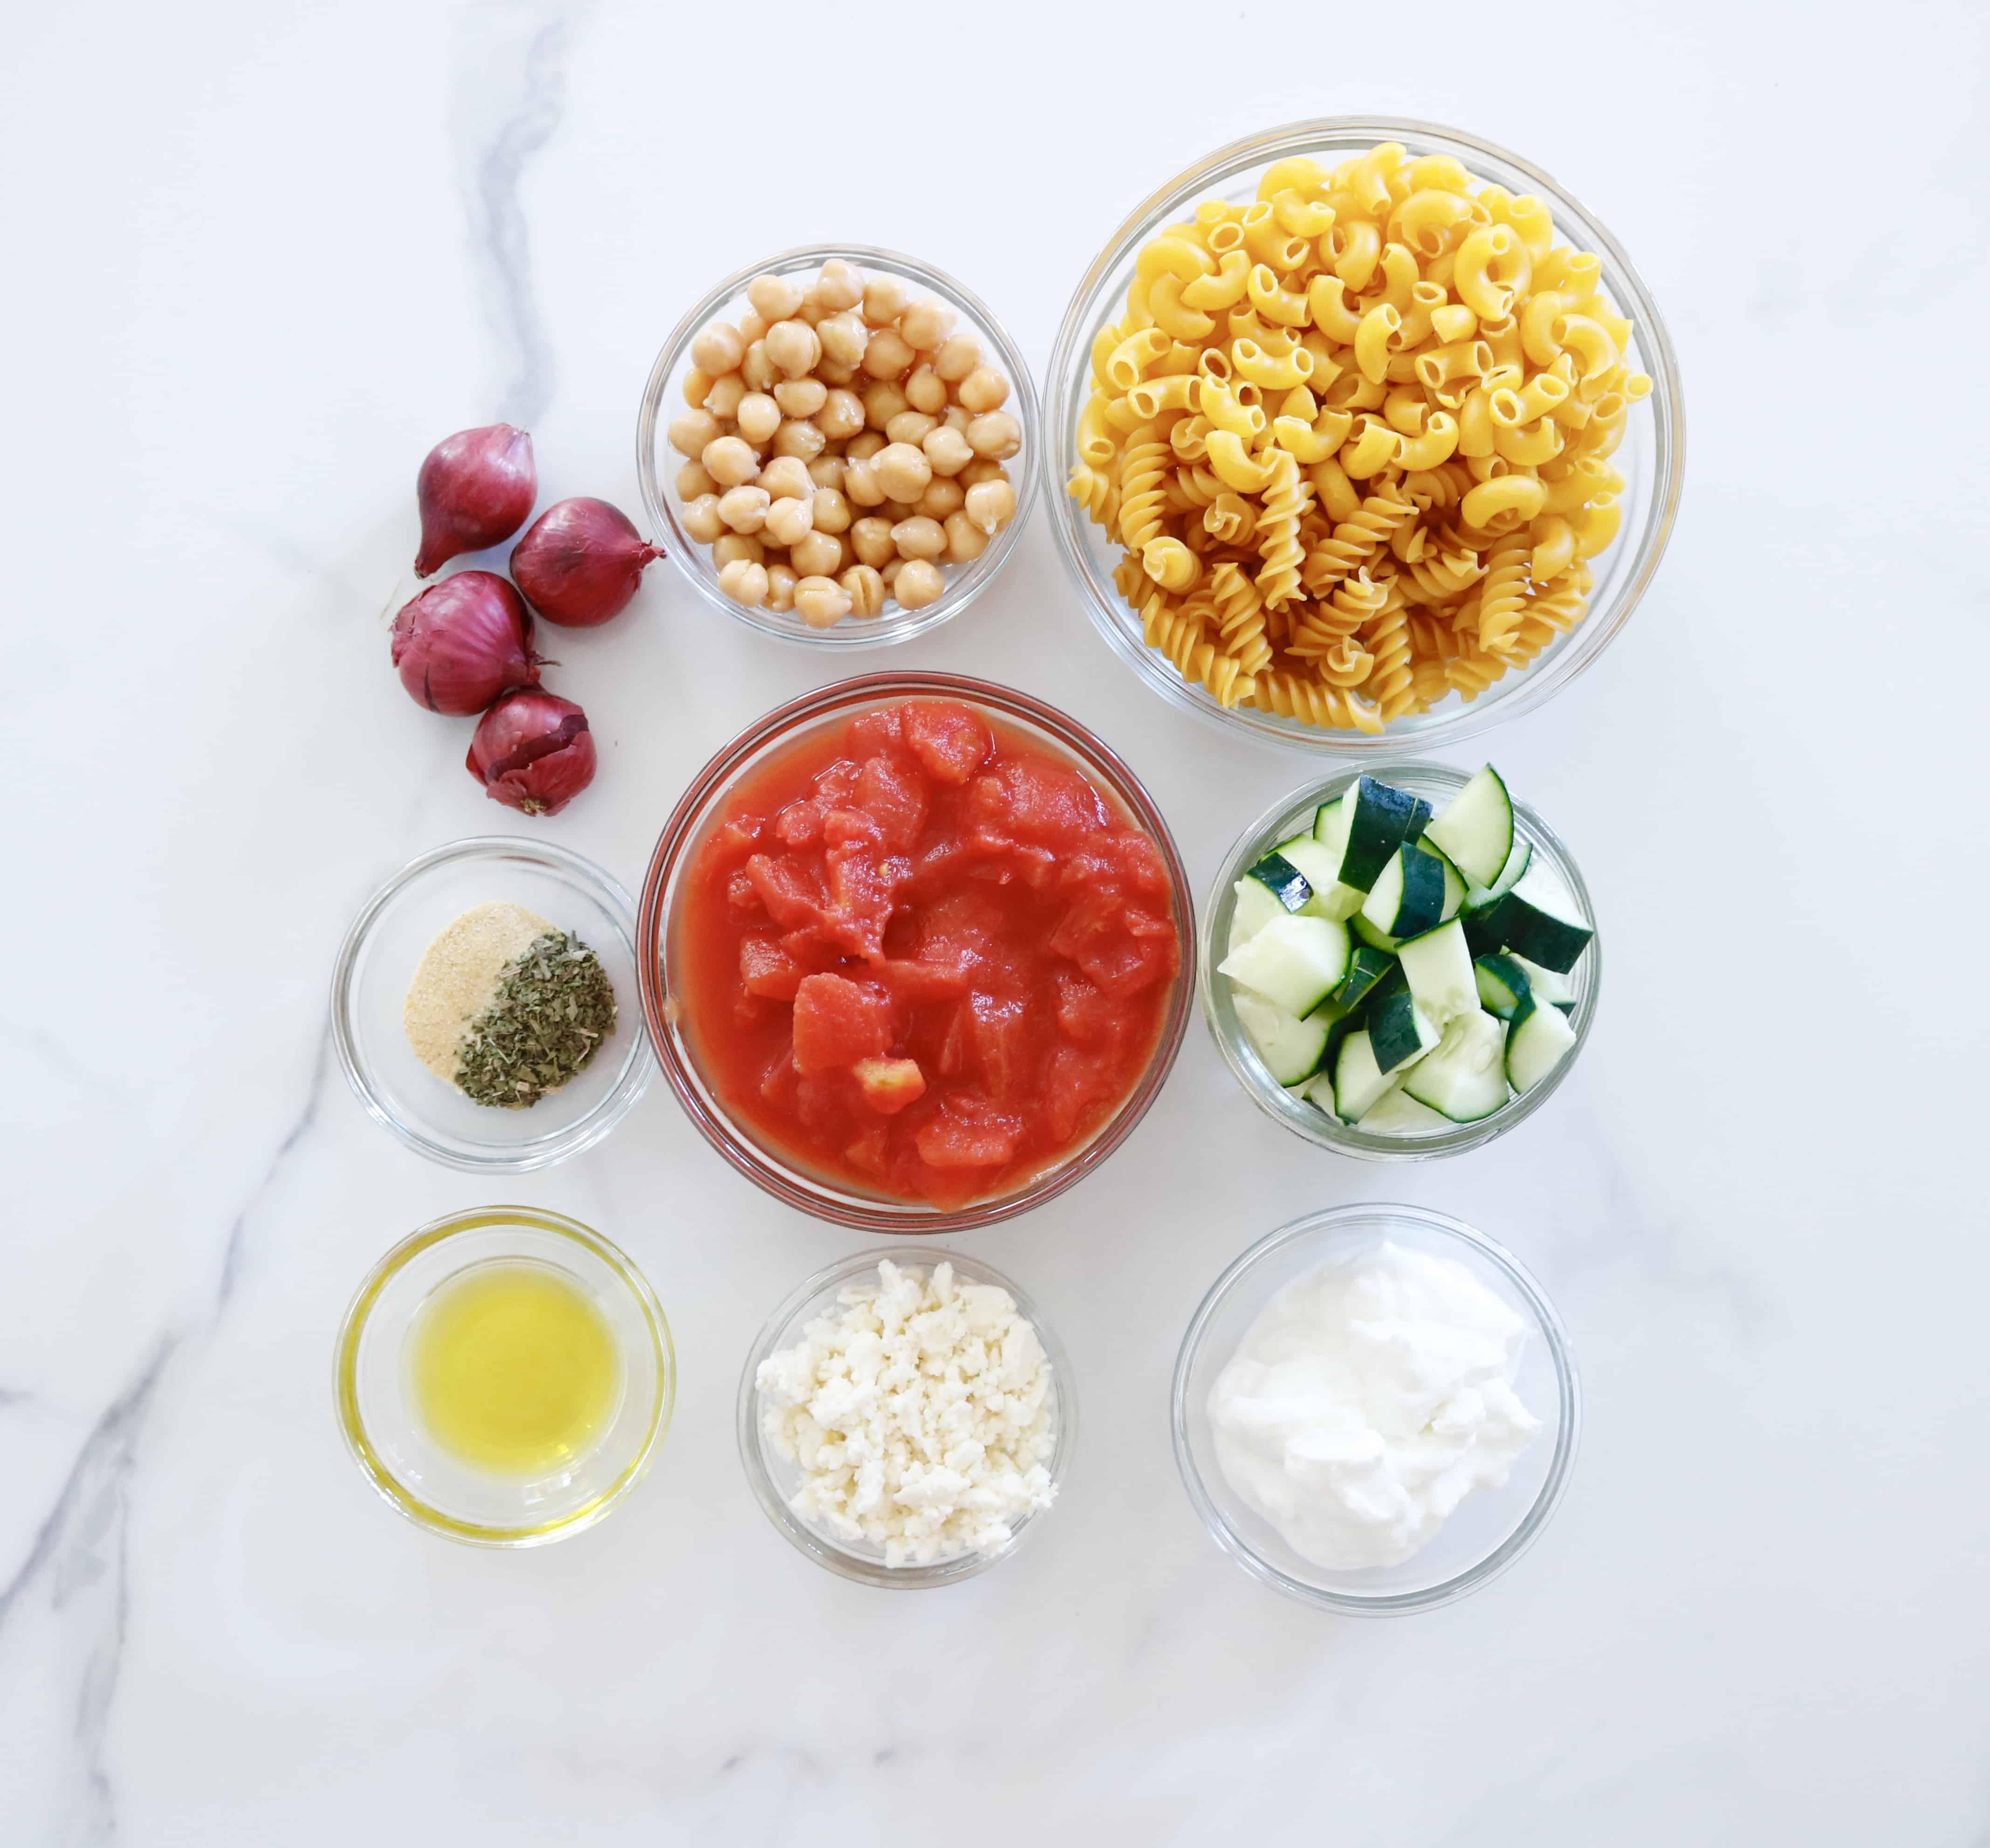 Mediterranean Pasta Salad - Vegetarian & Gluten Free @shawsimpleswaps